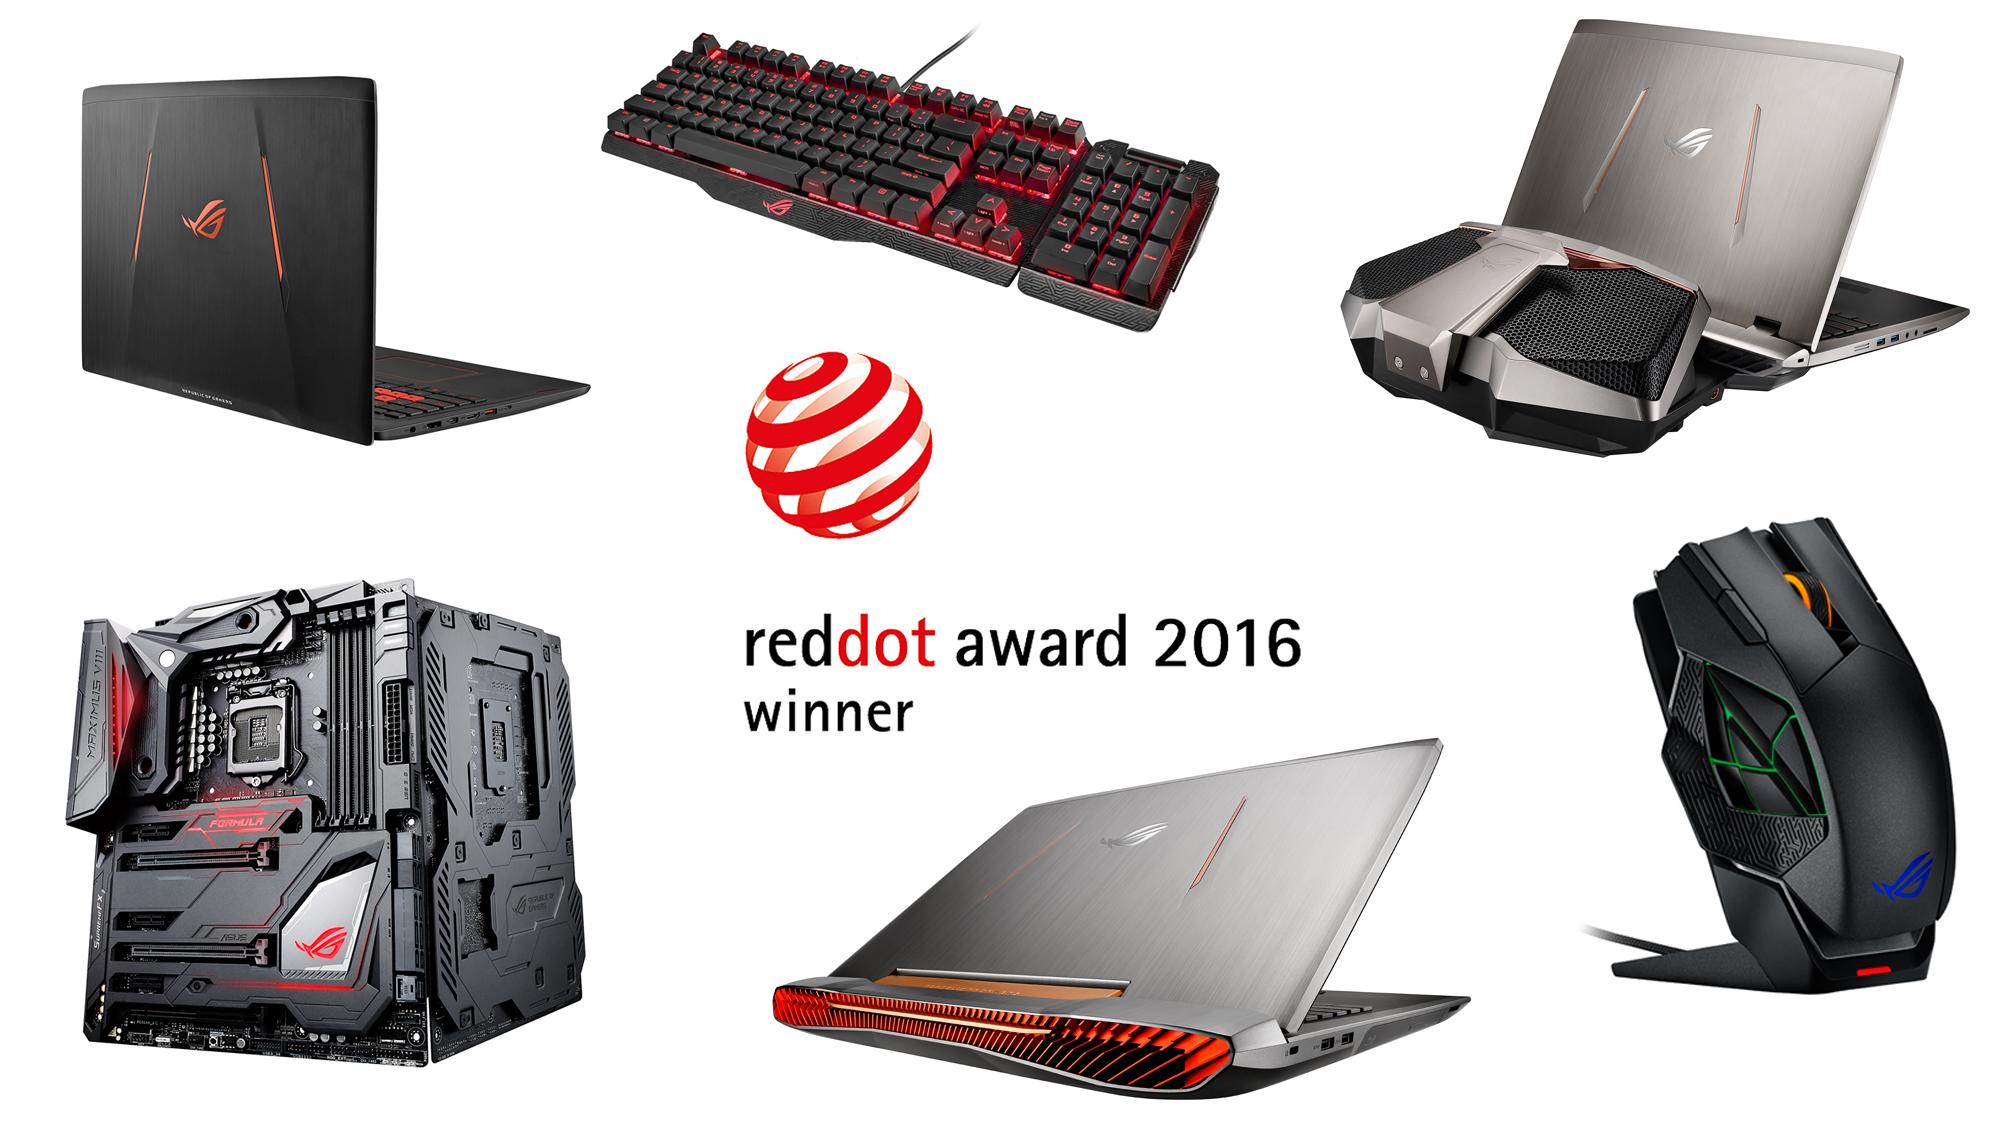 Red Dot Award Rog Republic Of Gamers Global